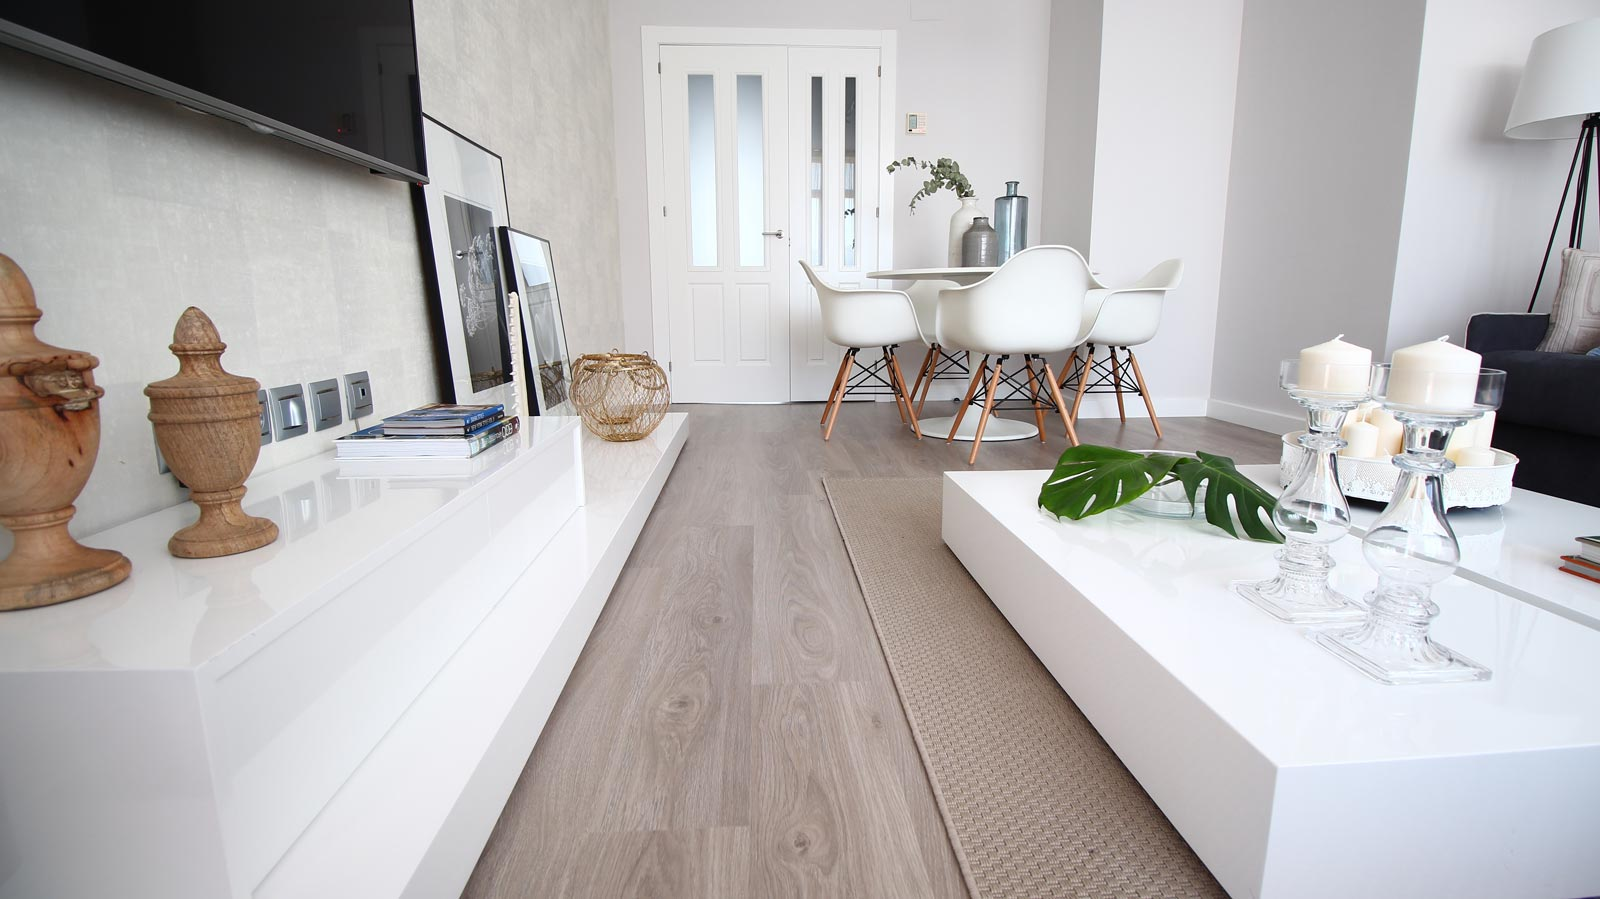 Alquiler de apartamentos en Málaga.